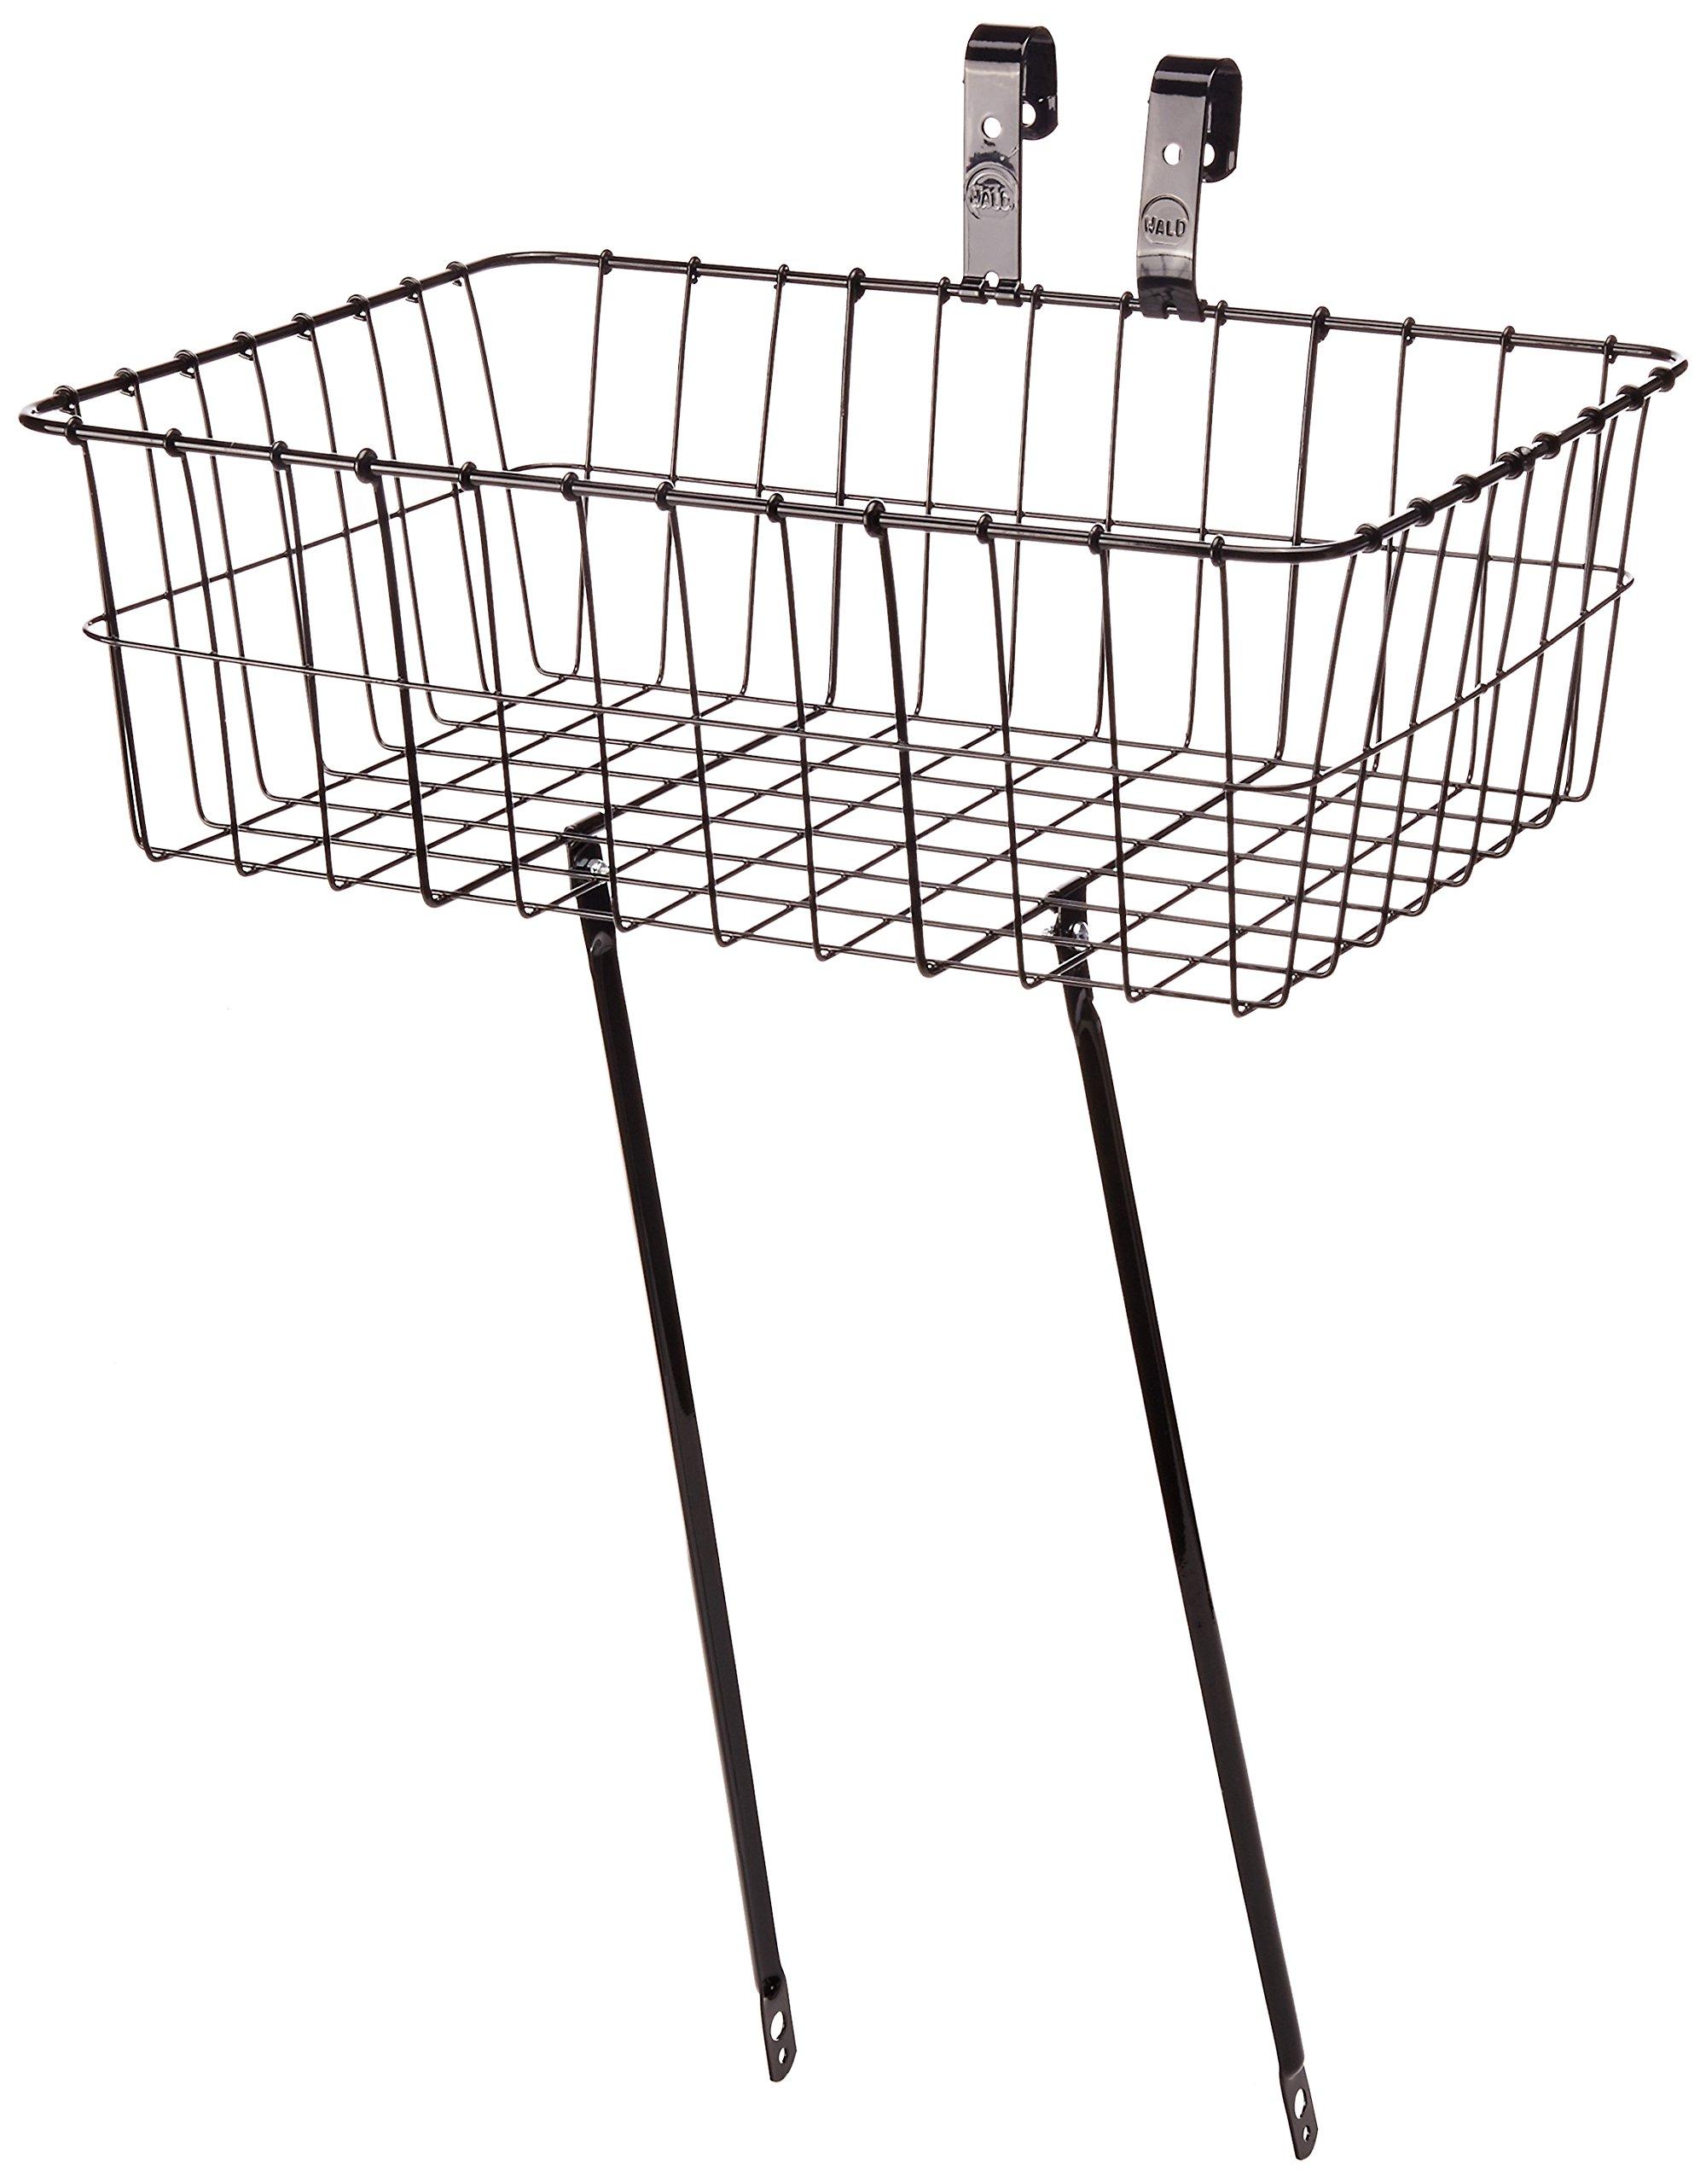 Wald 139 Front Bicycle Basket (18 x 13 x 6, Black)